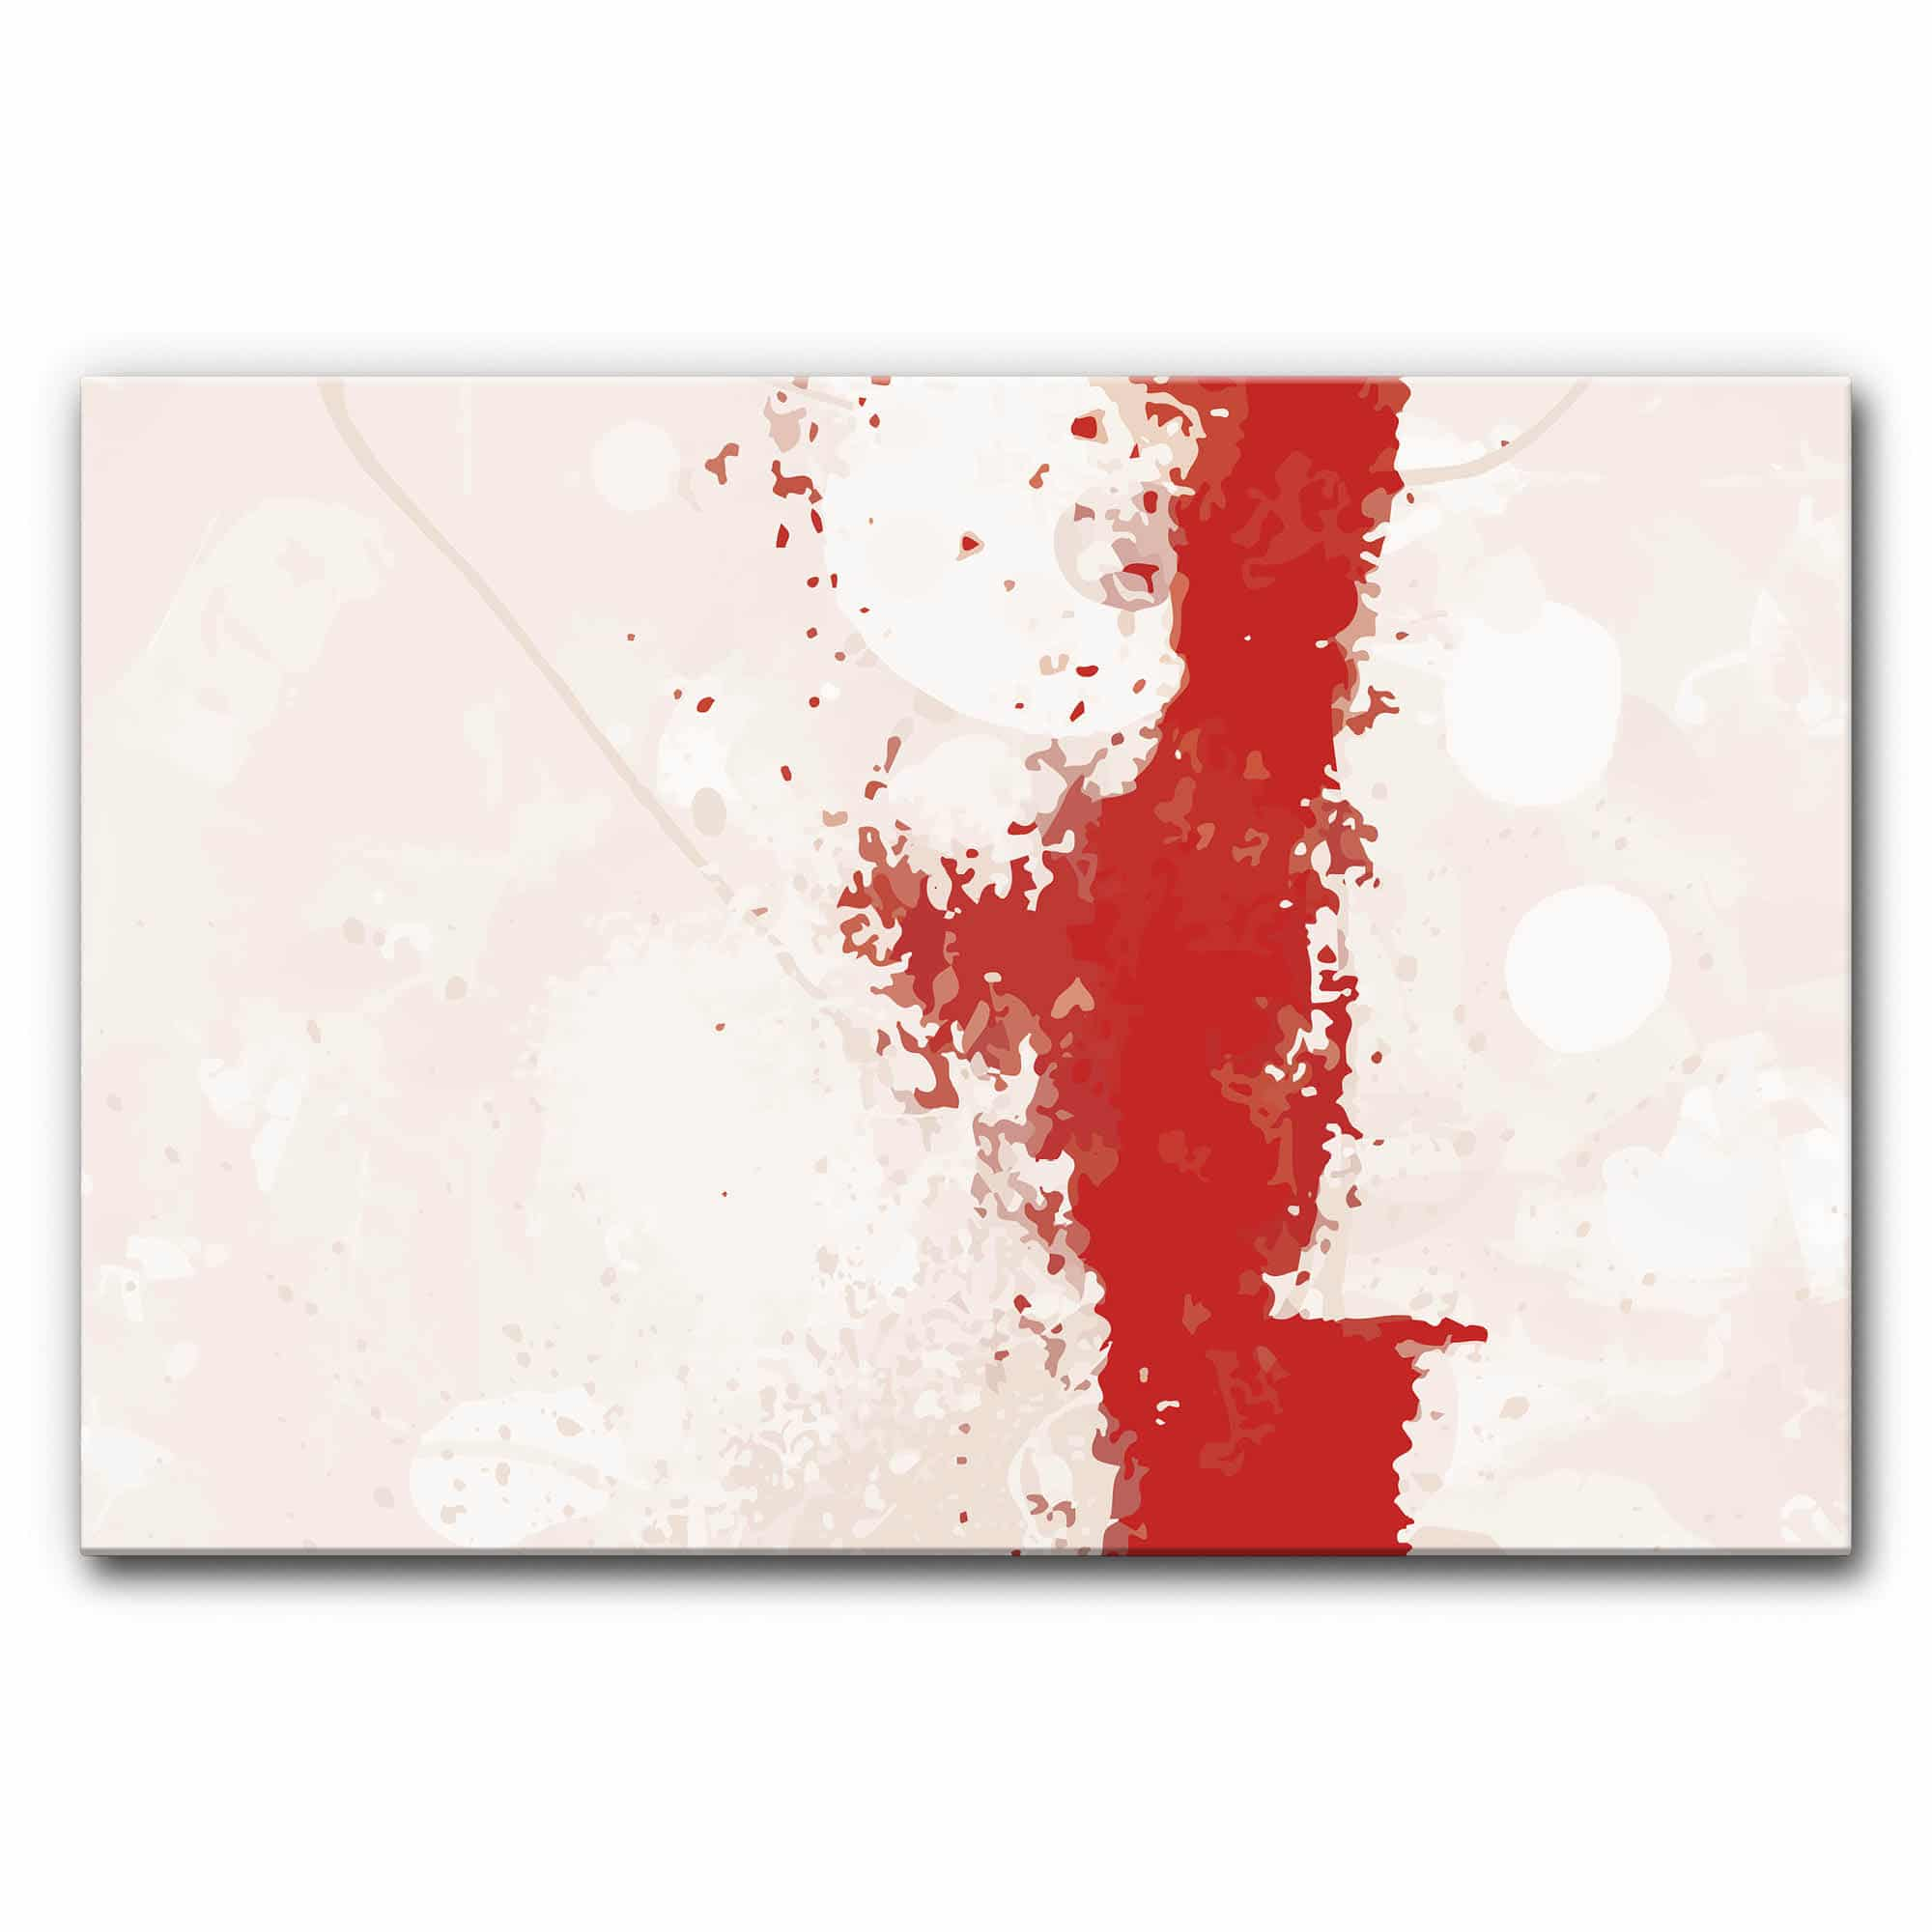 Akustikbild Balance Straight Red im Format 120x80